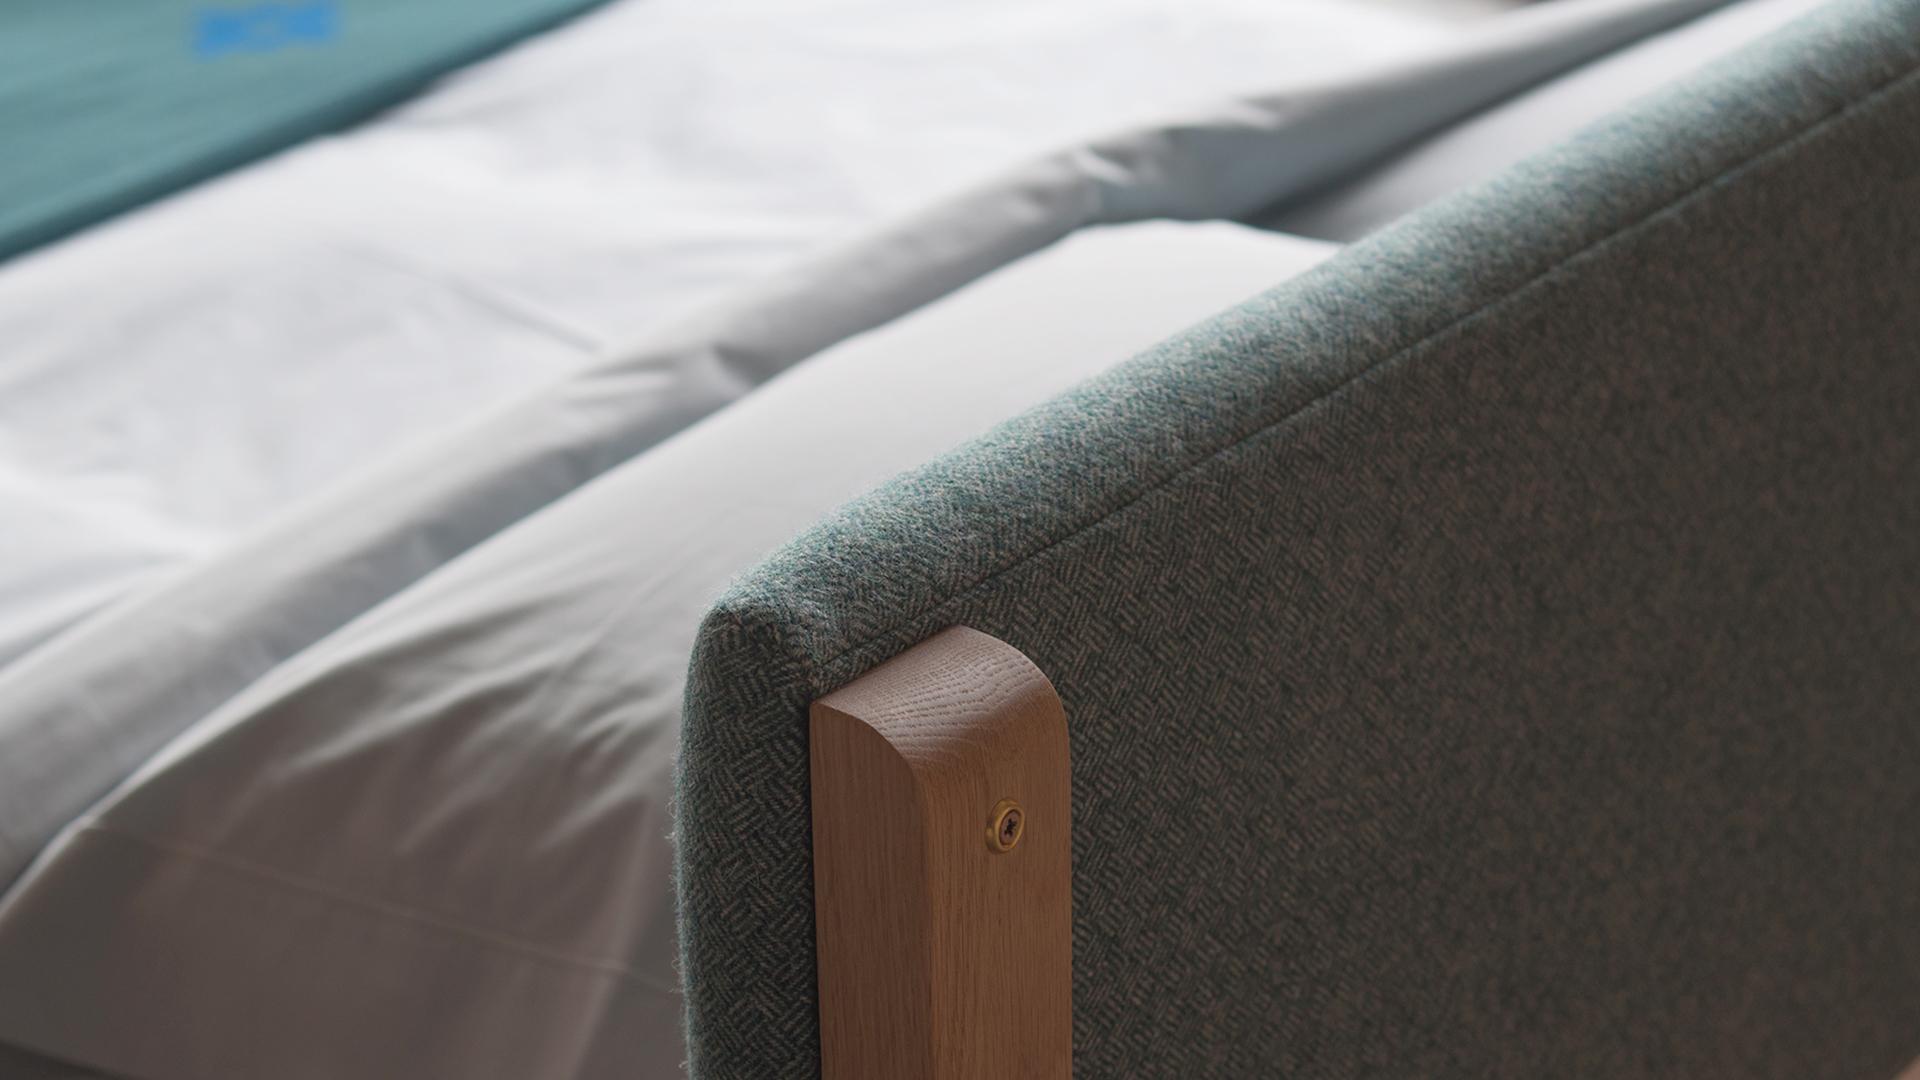 pure wool upholstered headboard back detail